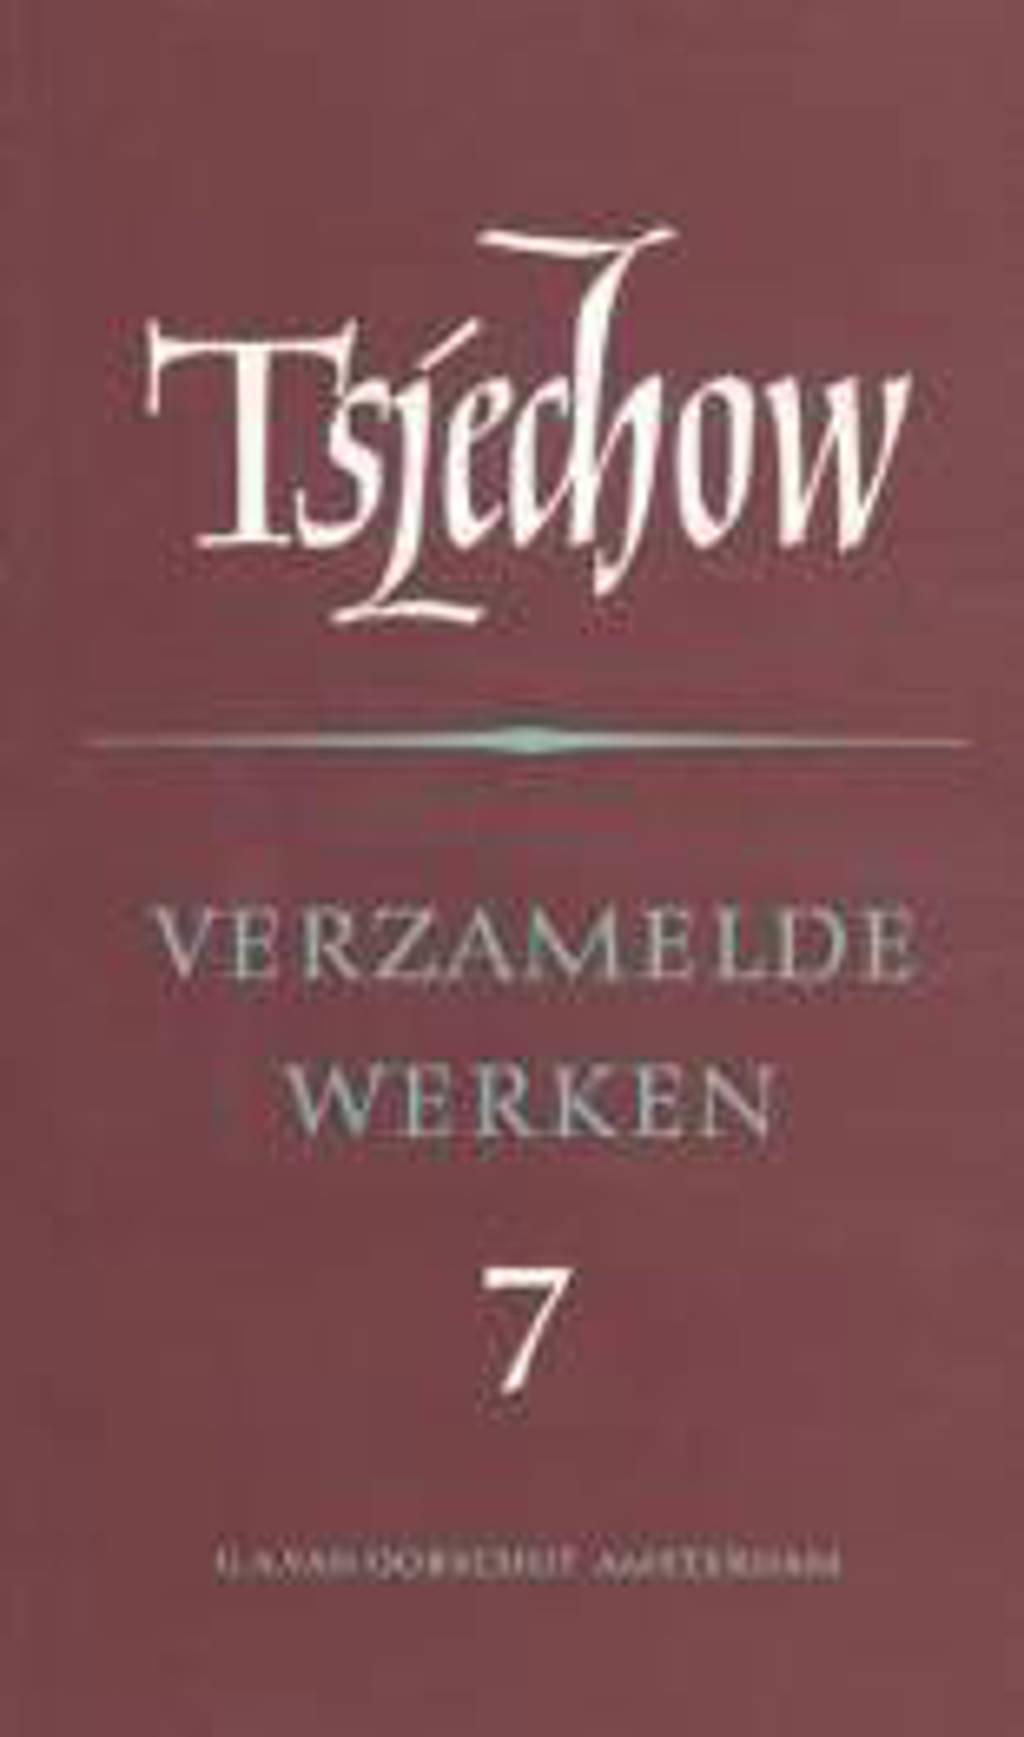 Russische Bibliotheek: Verzamelde werken 7 Brieven - A.P. Tsjechov